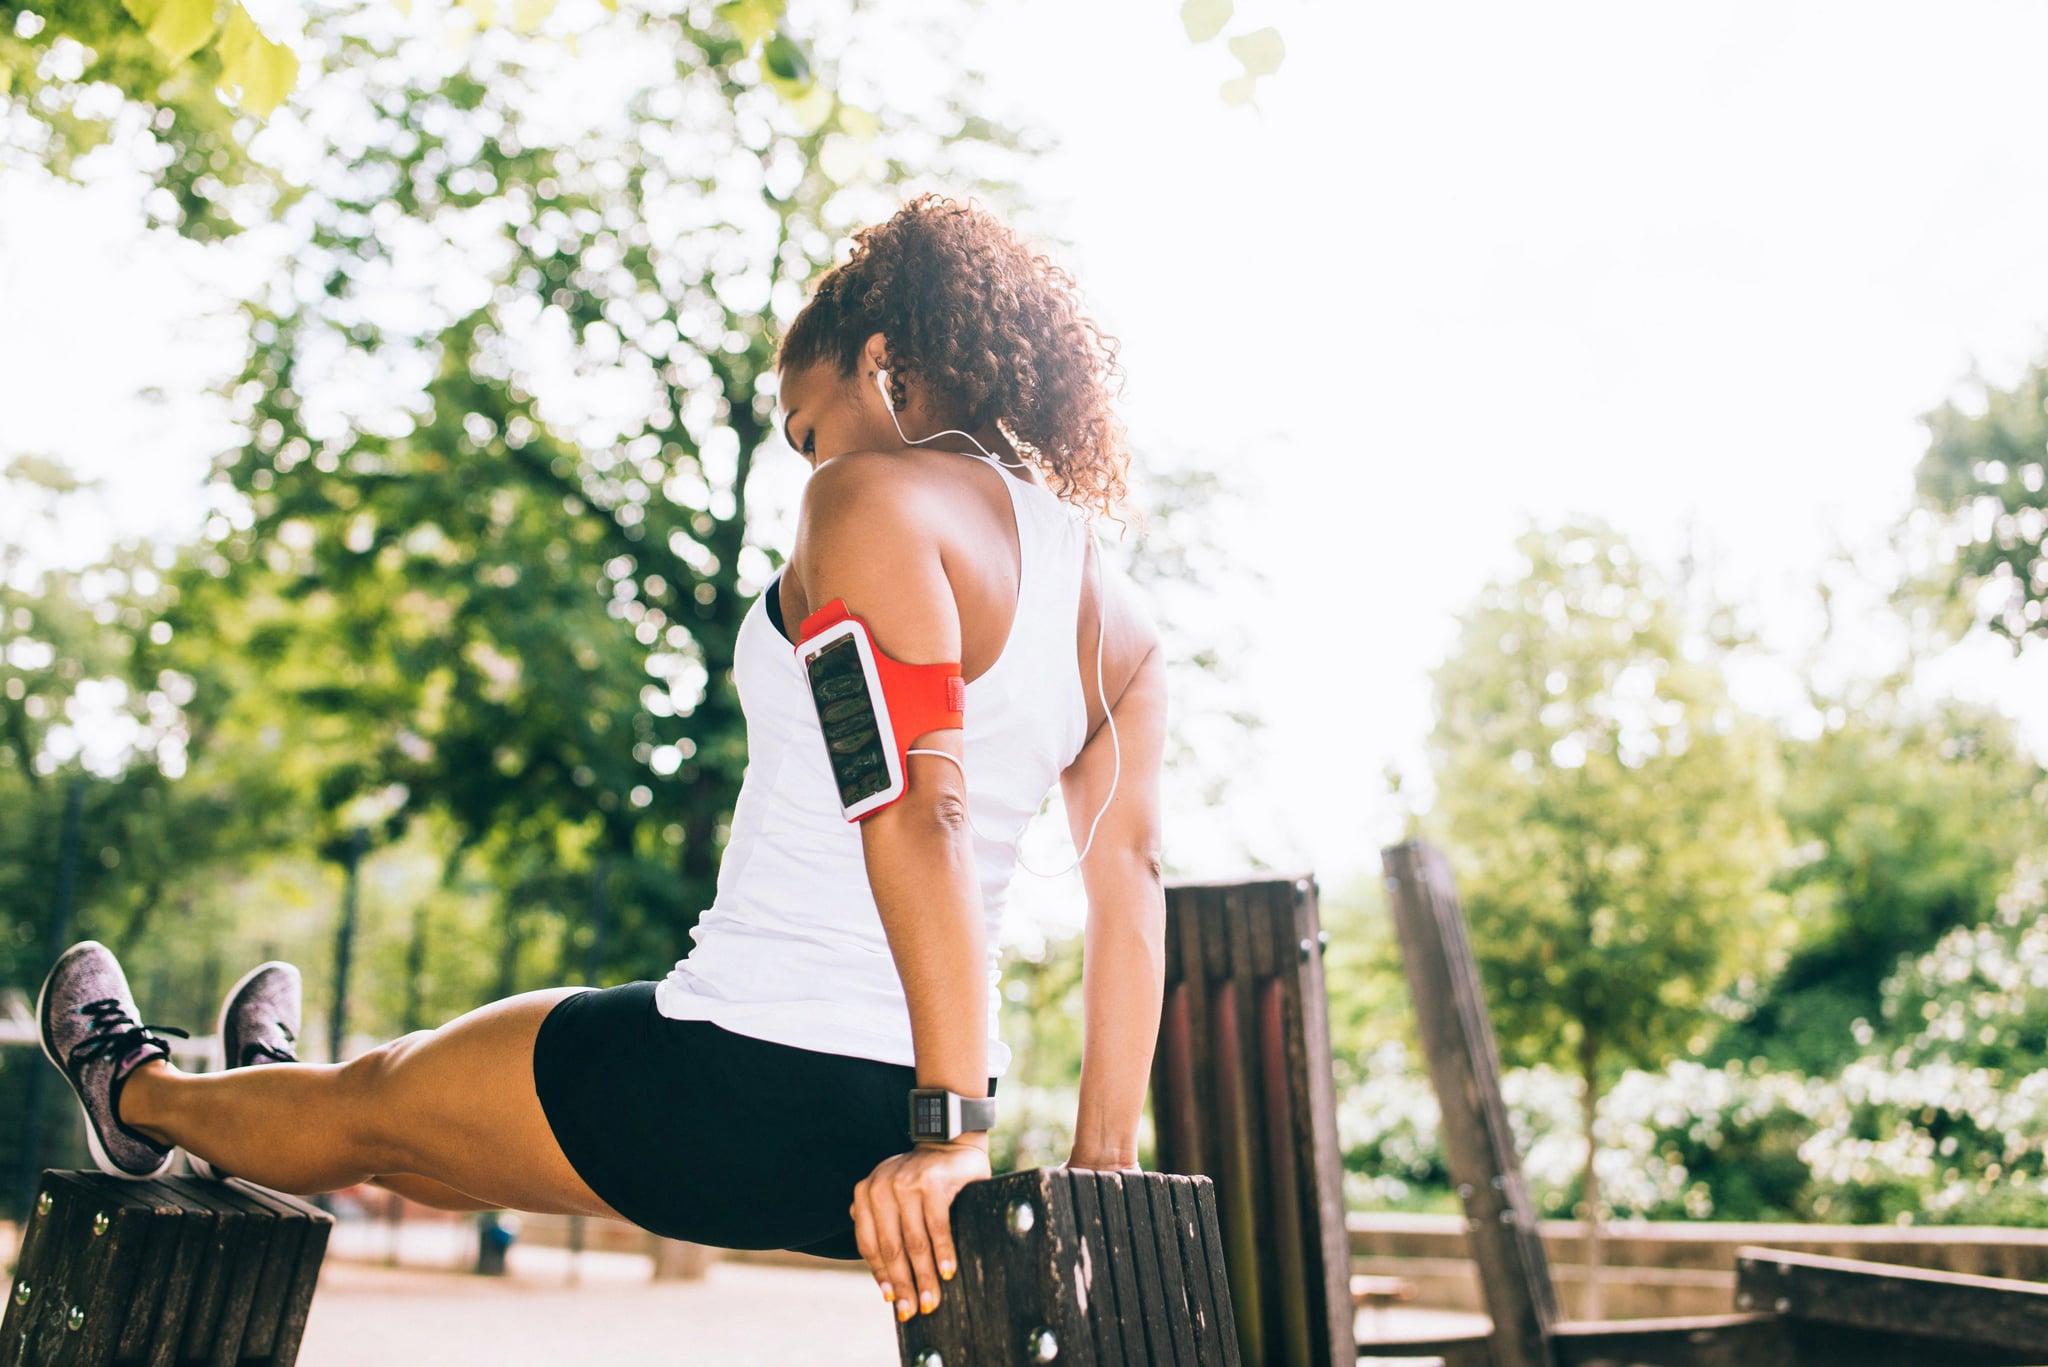 Woman doing dips outdoor.